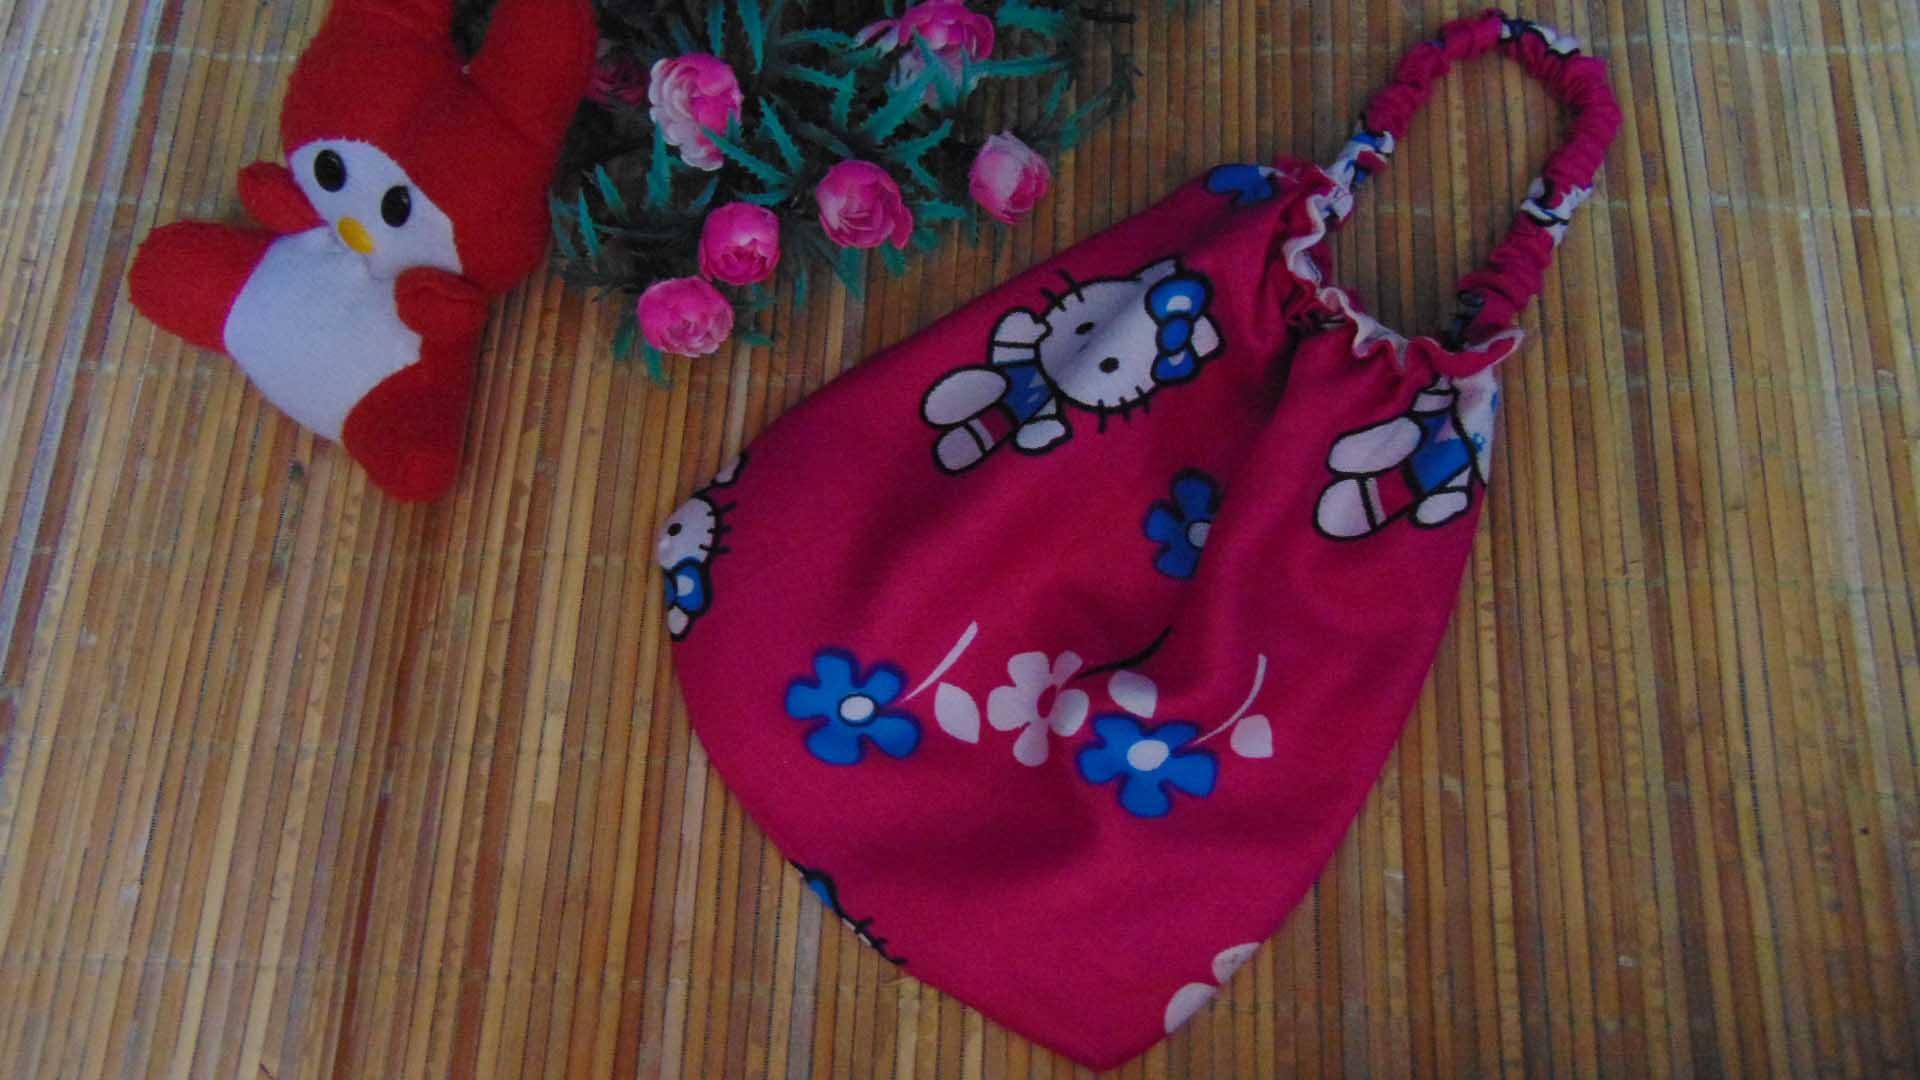 Detail Gambar kembarshop - FREE Pouch Tas Mukena Anak Bayi 0-2th Murah Adem  Banget Motif Hello Kitty Pink Terbaru acebddc35d